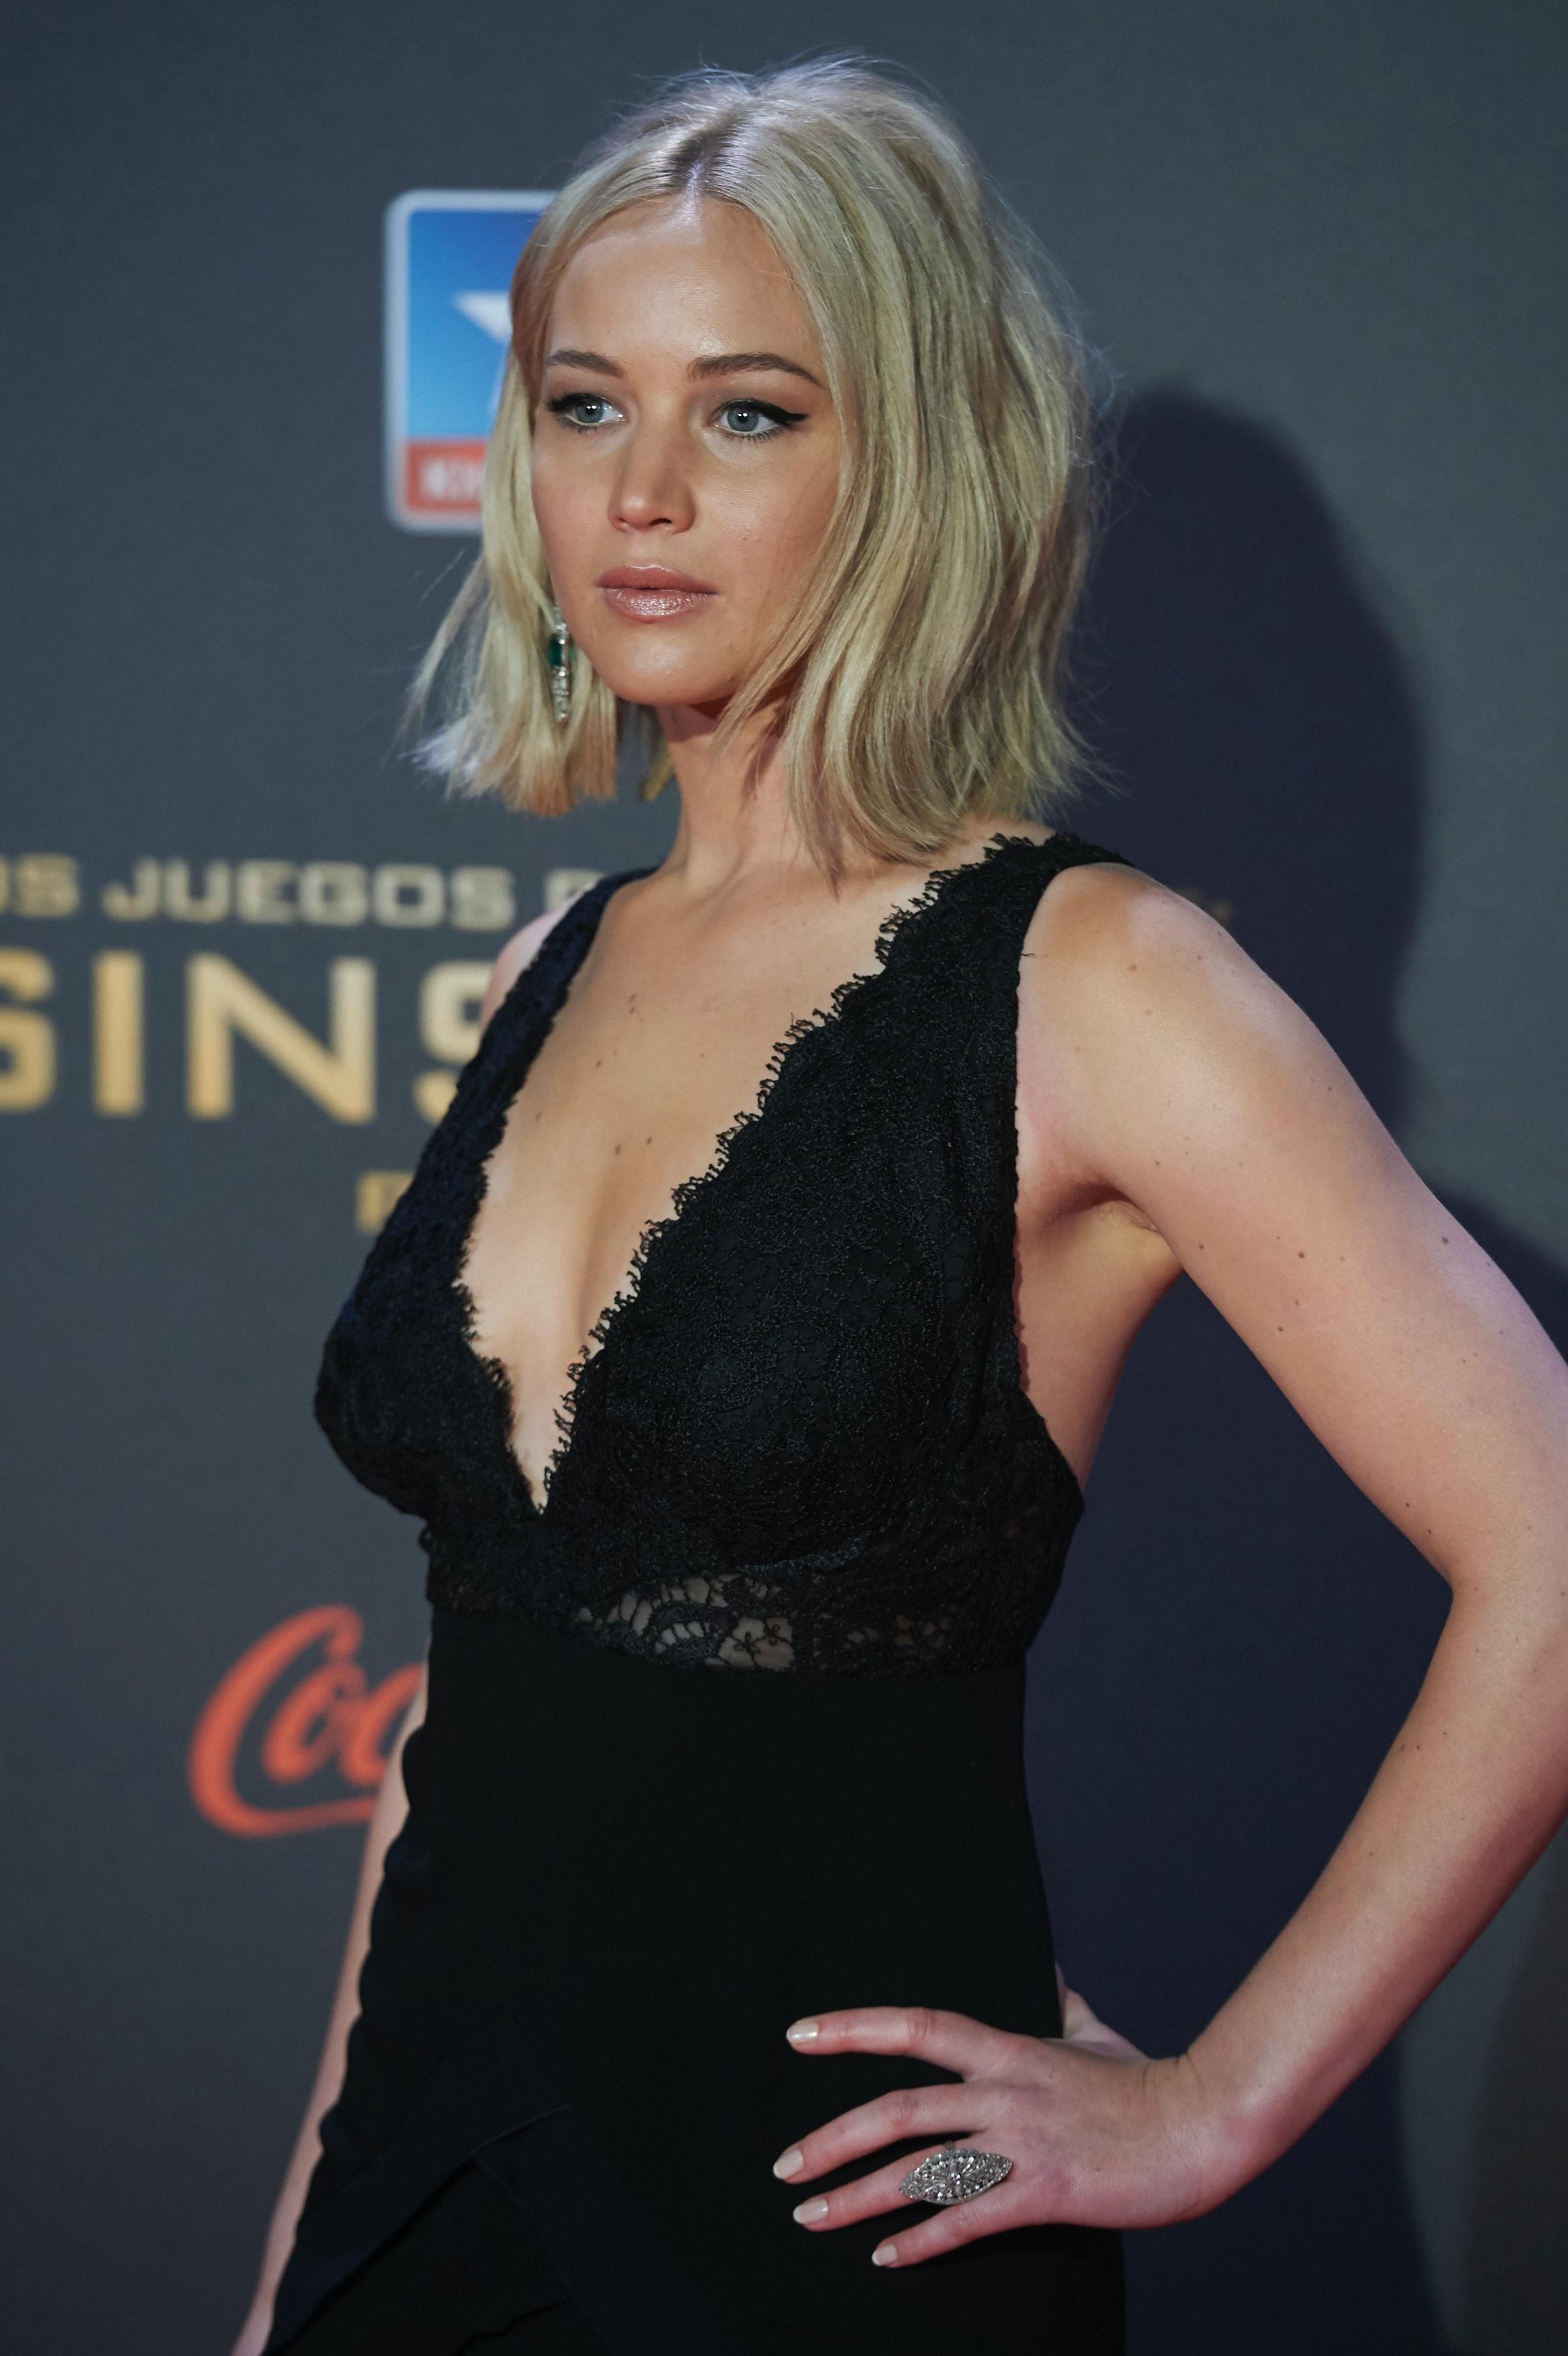 Jennifer Lawrence Wears Black Dress To The Madrid 'Mockingjay ...